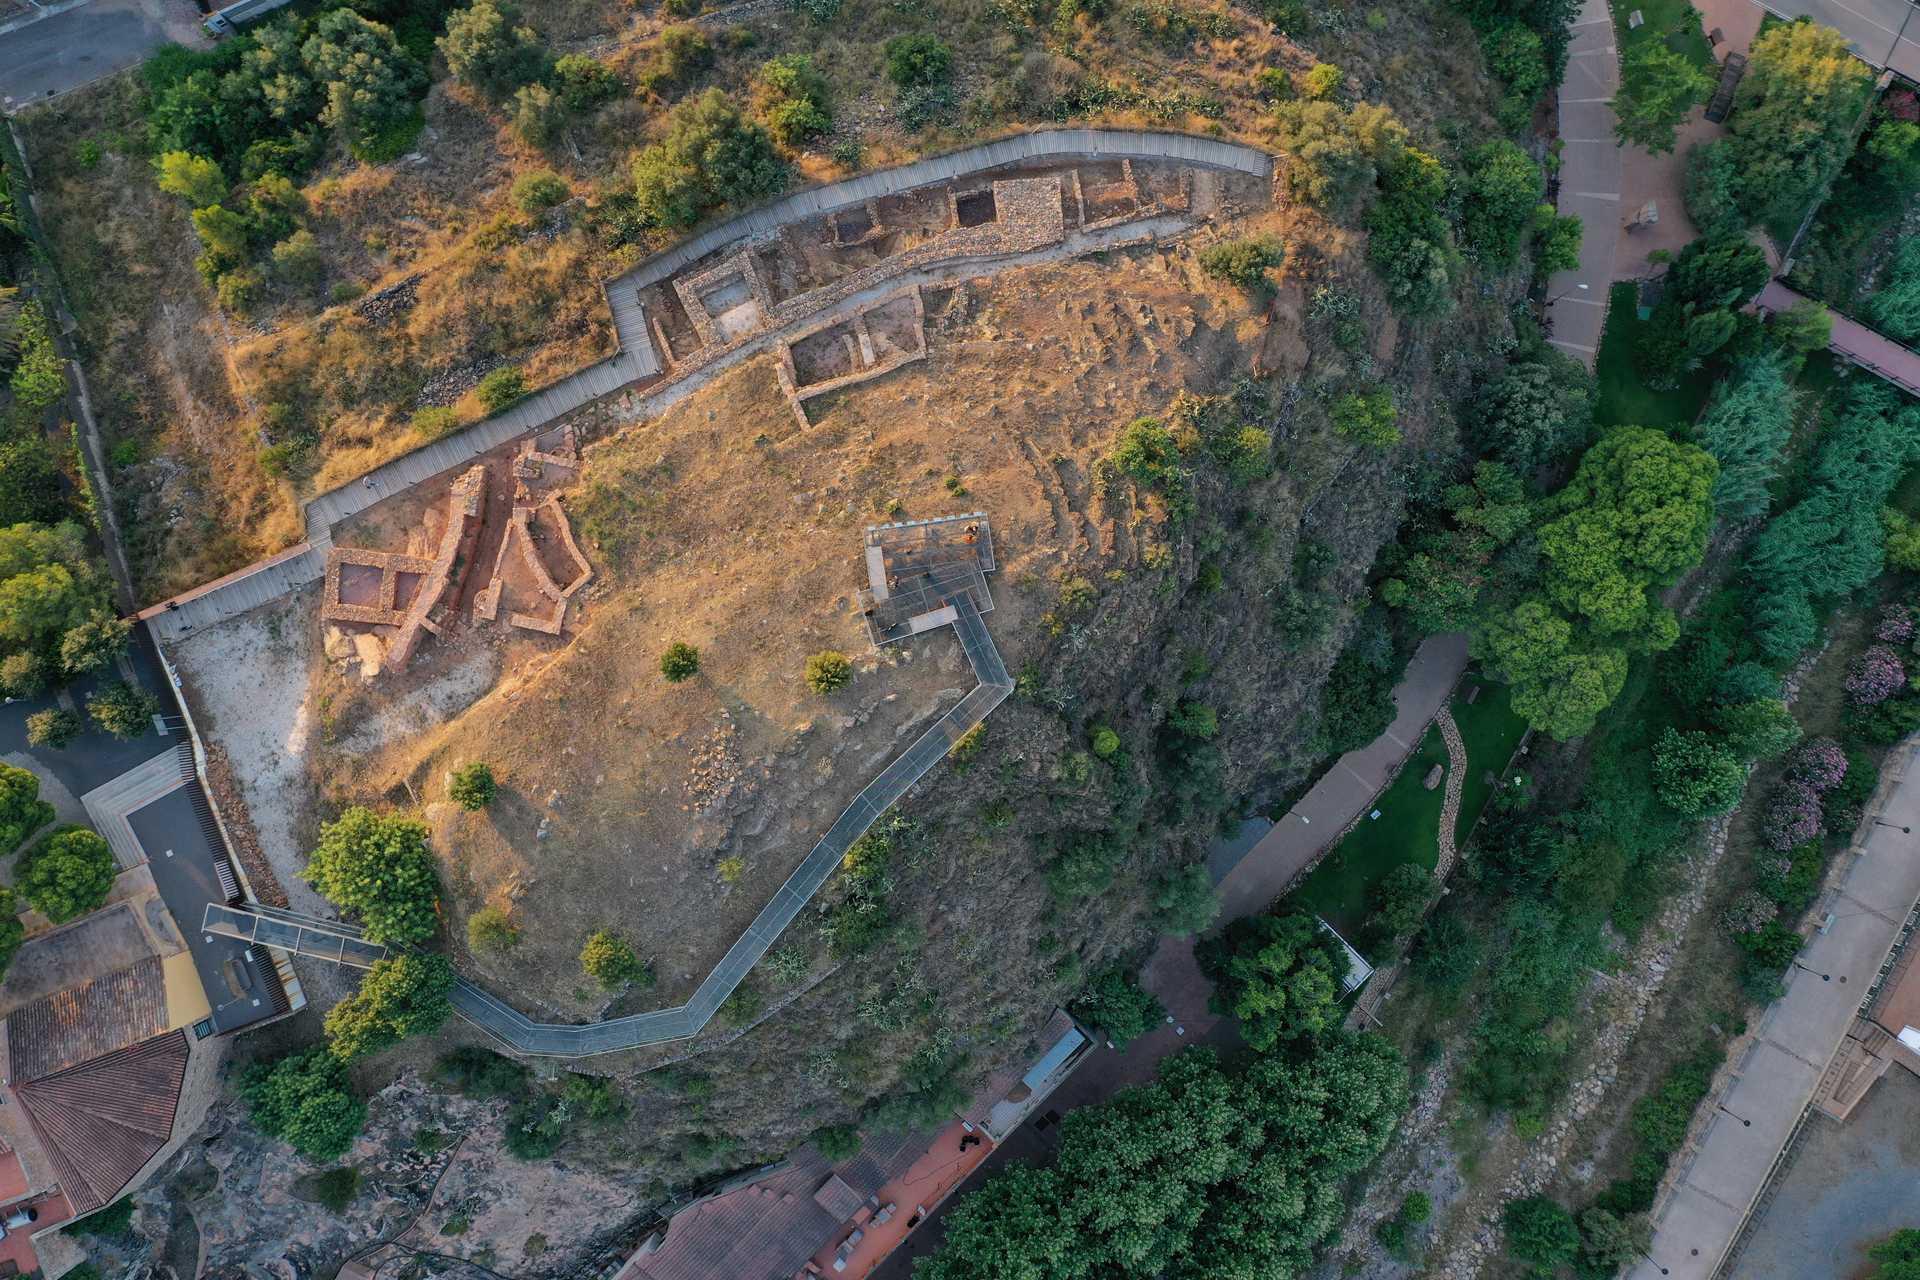 Yacimiento íbero-romano del Poblat Sant Josep